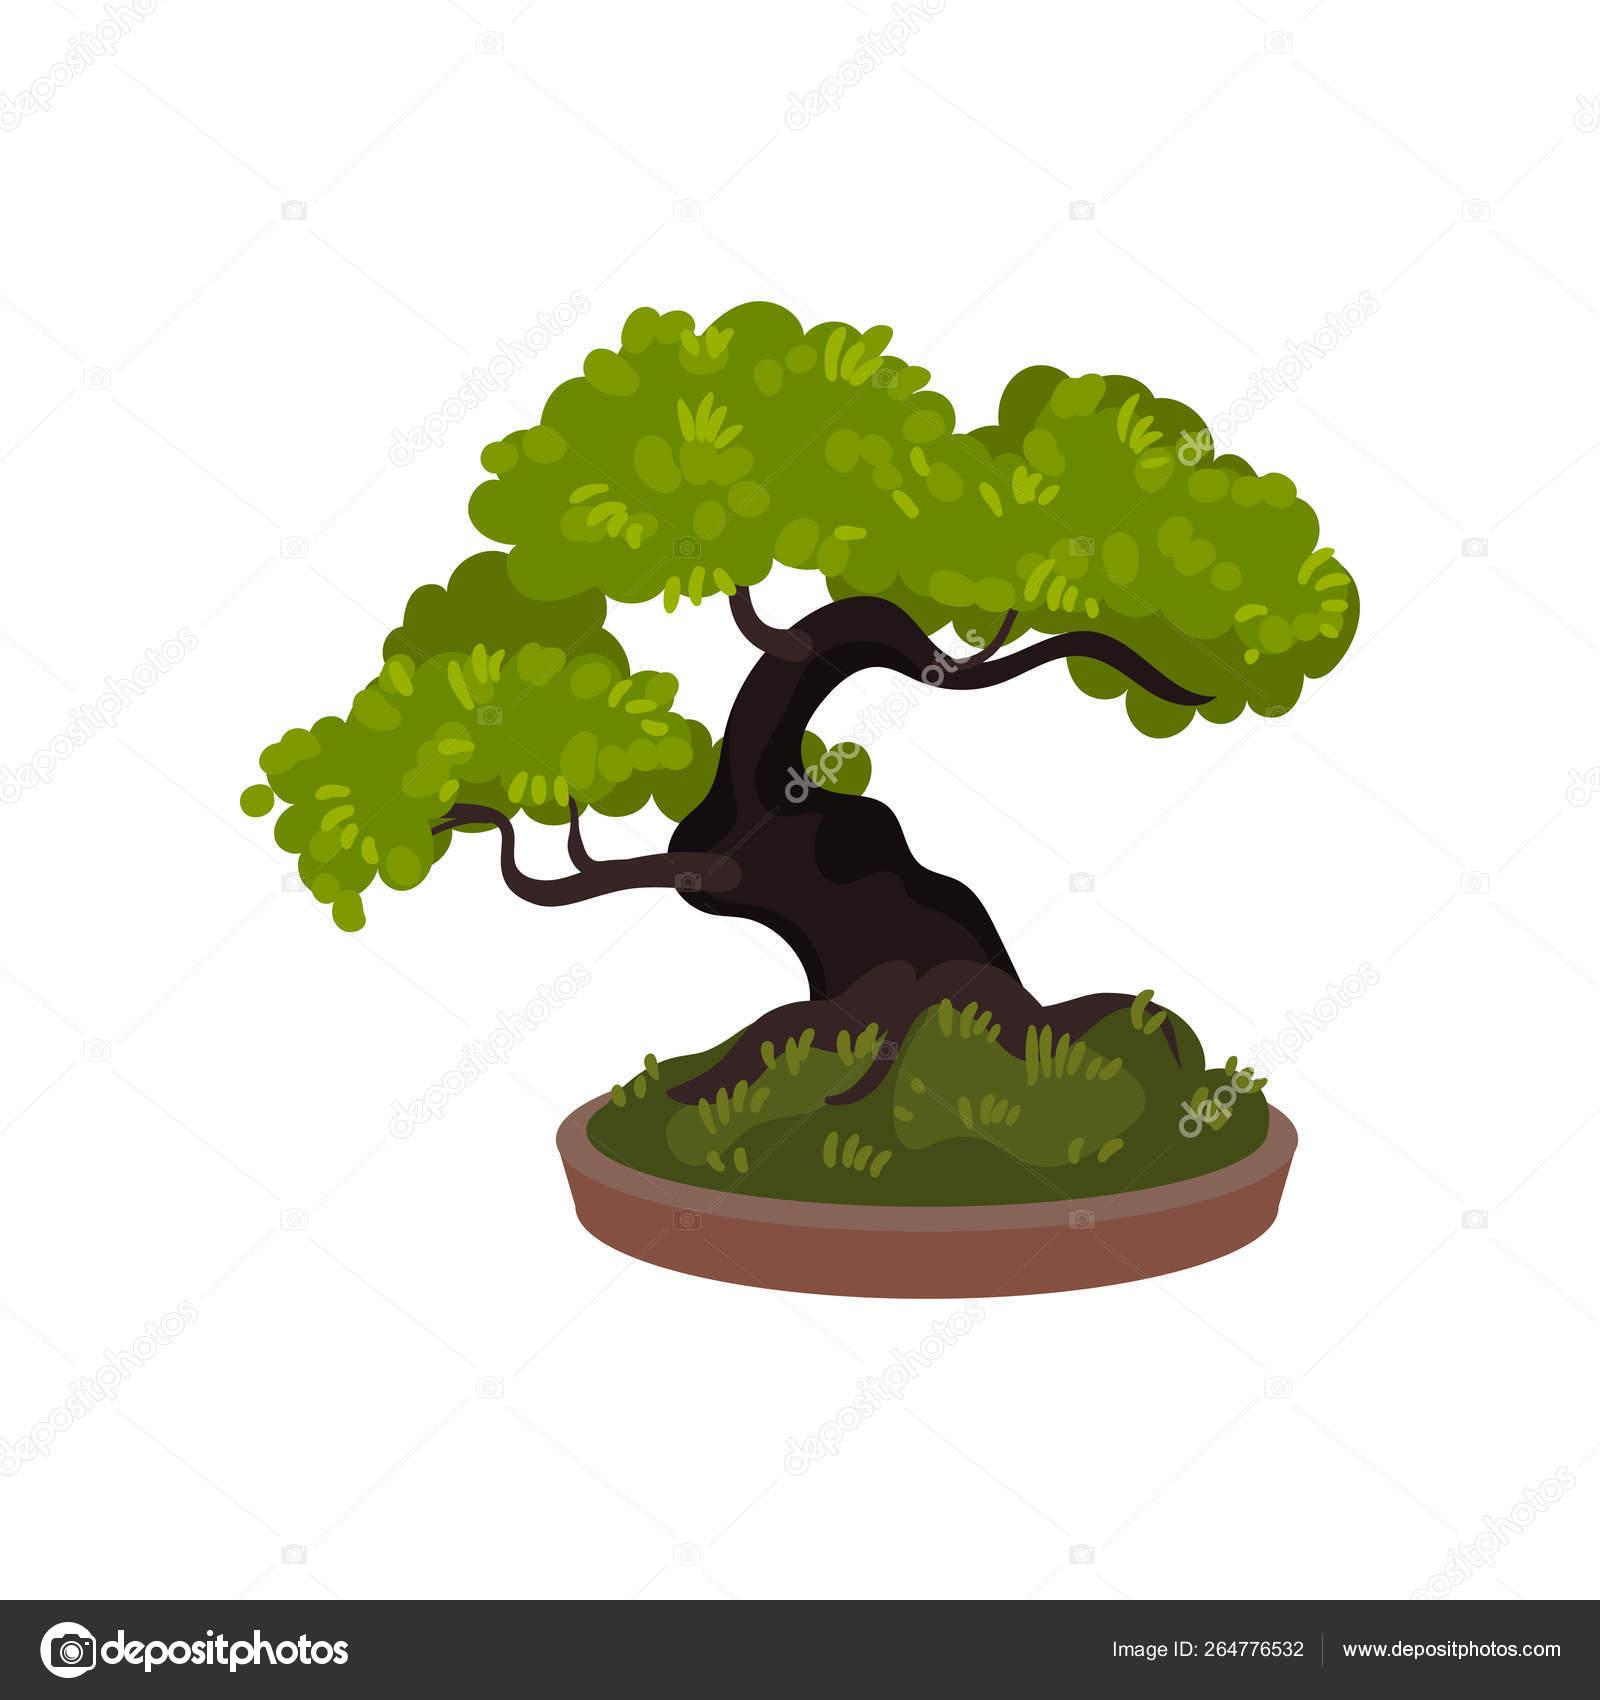 Bonsai Tree In A Pot Vector Illustration Stock Vector C Happypictures 264776532